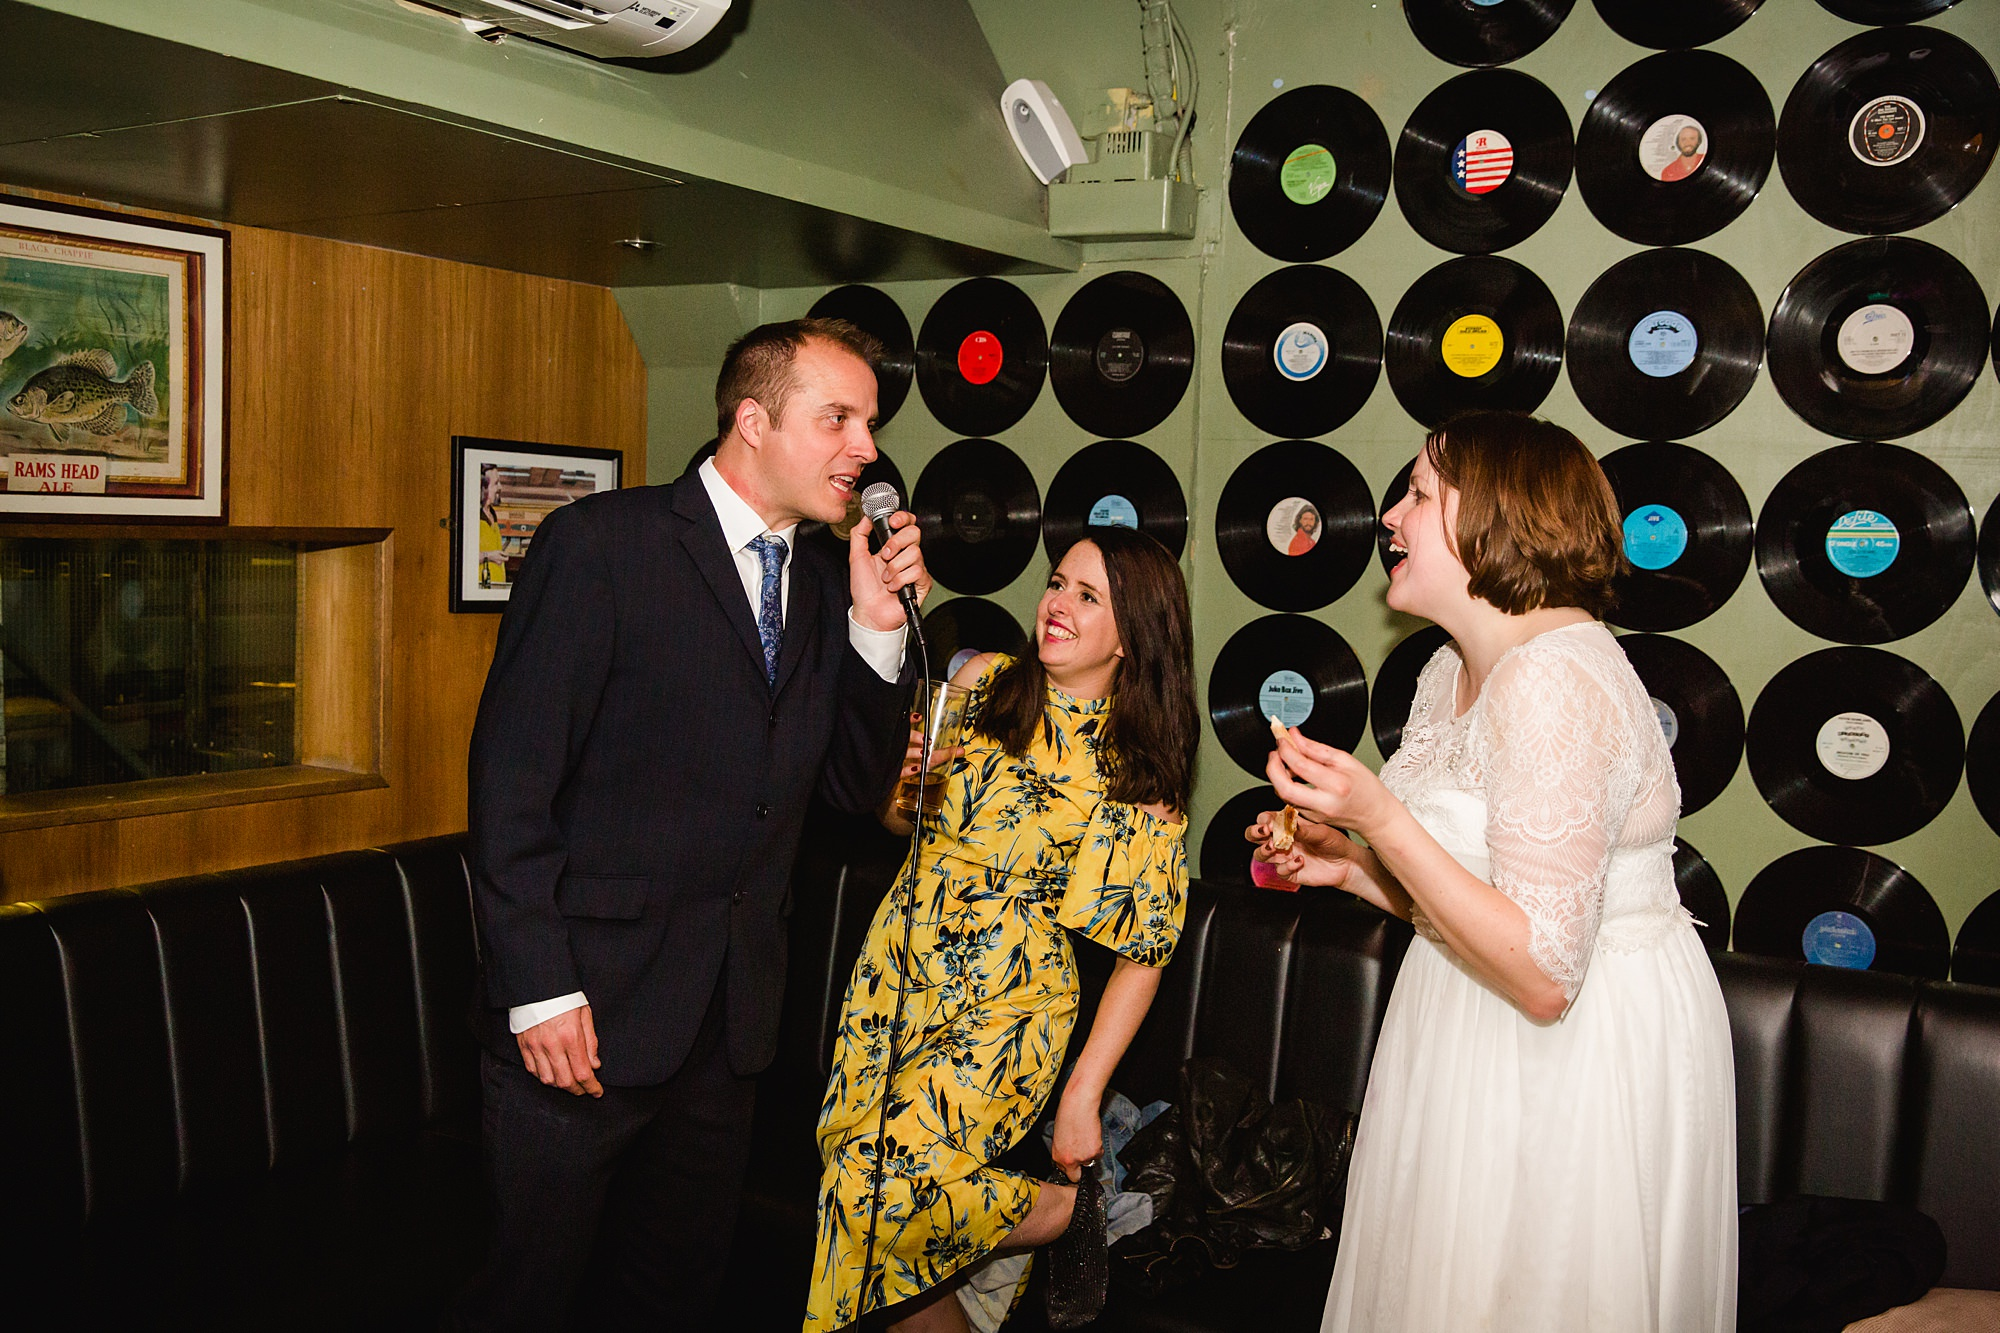 fun london wedding bowling guests sing karaoke